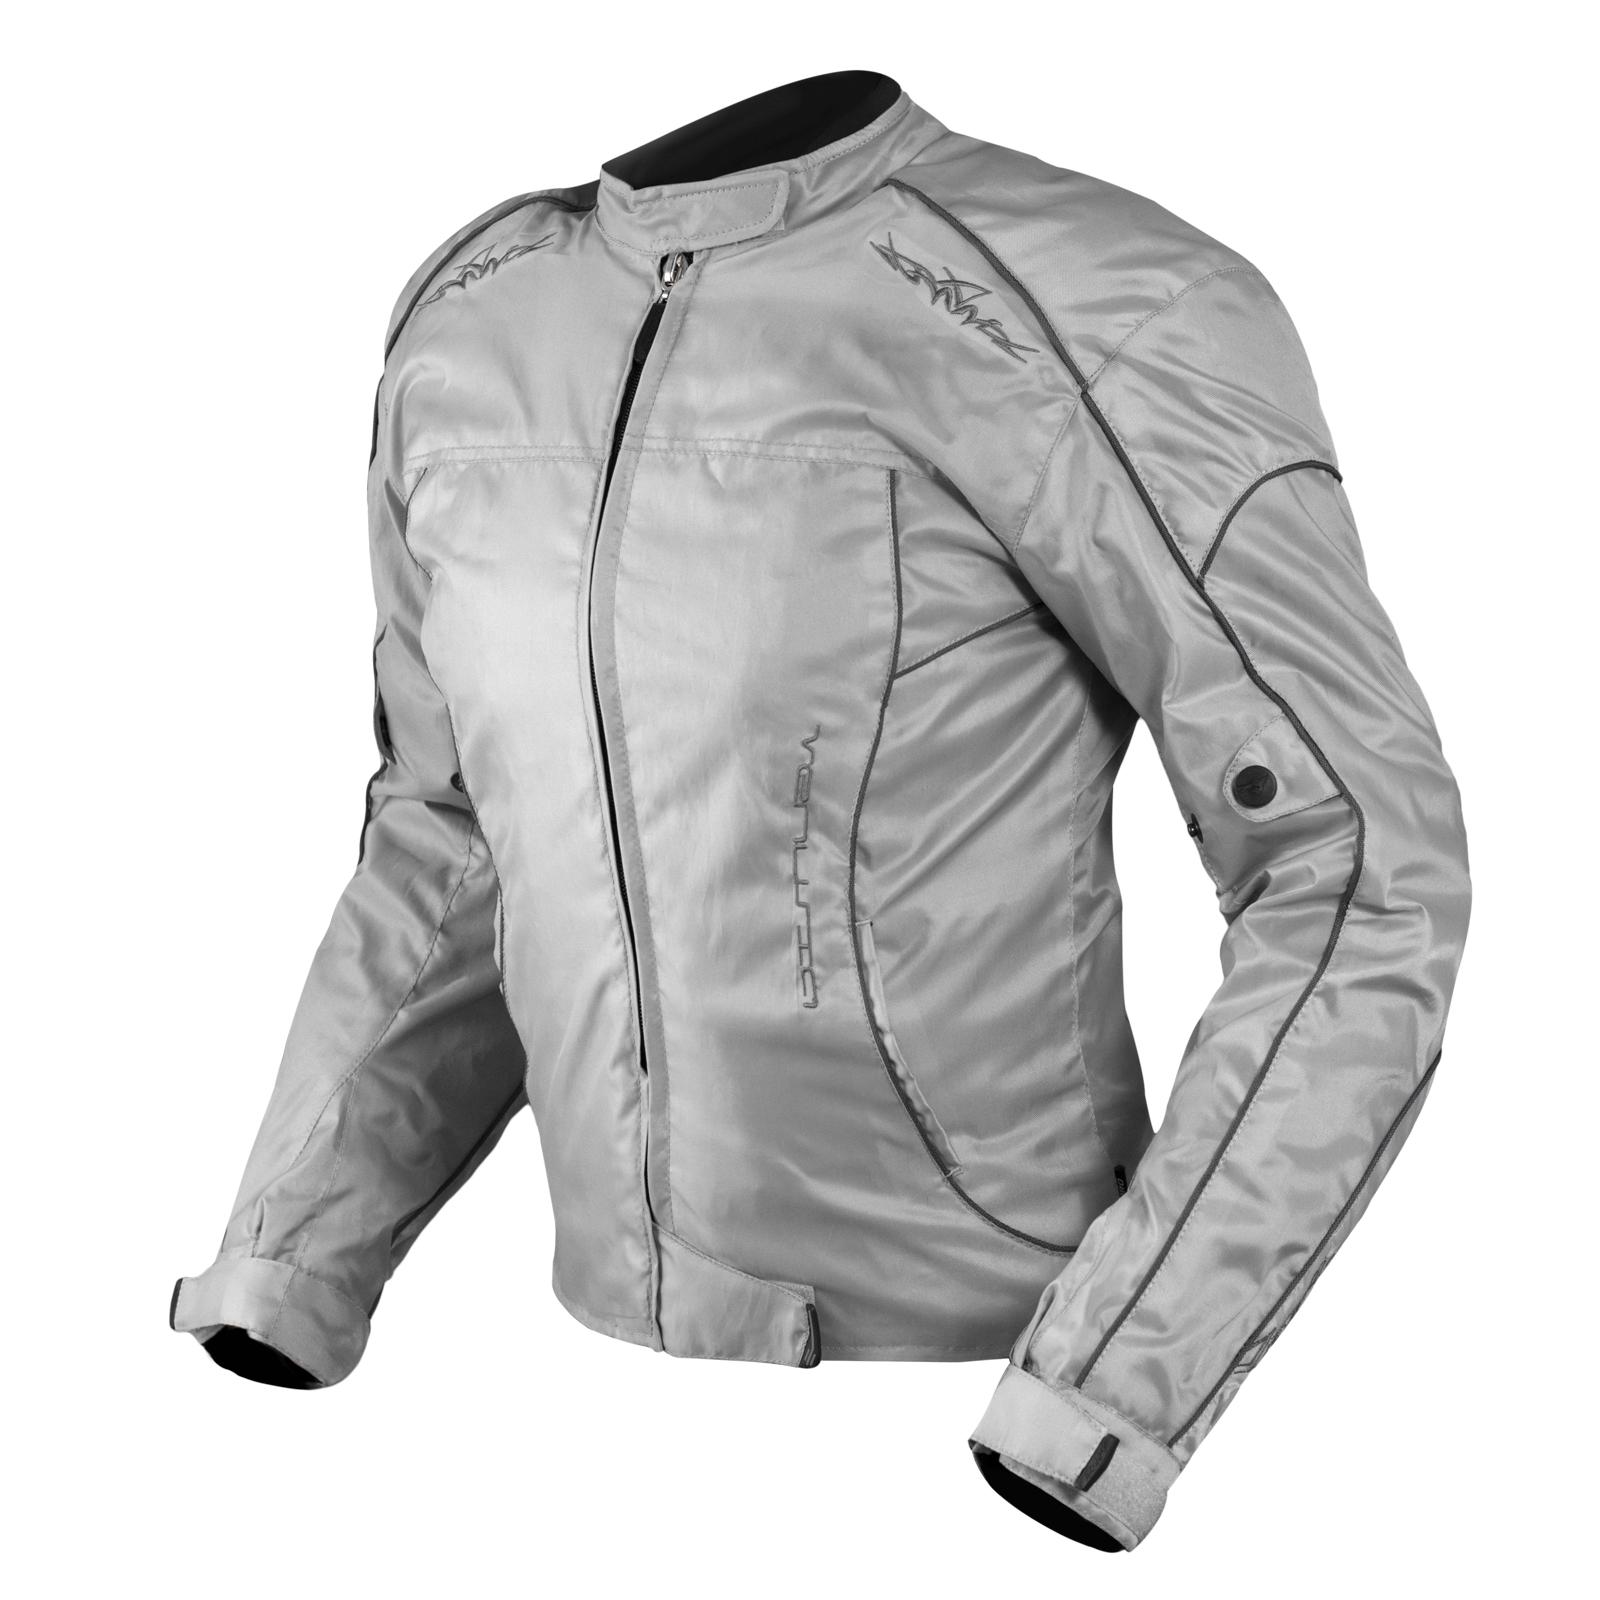 Giacca-Lady-Moto-Donna-Tessuto-Protezioni-CE-Termico-Sfoderabile-Scooter miniatura 15